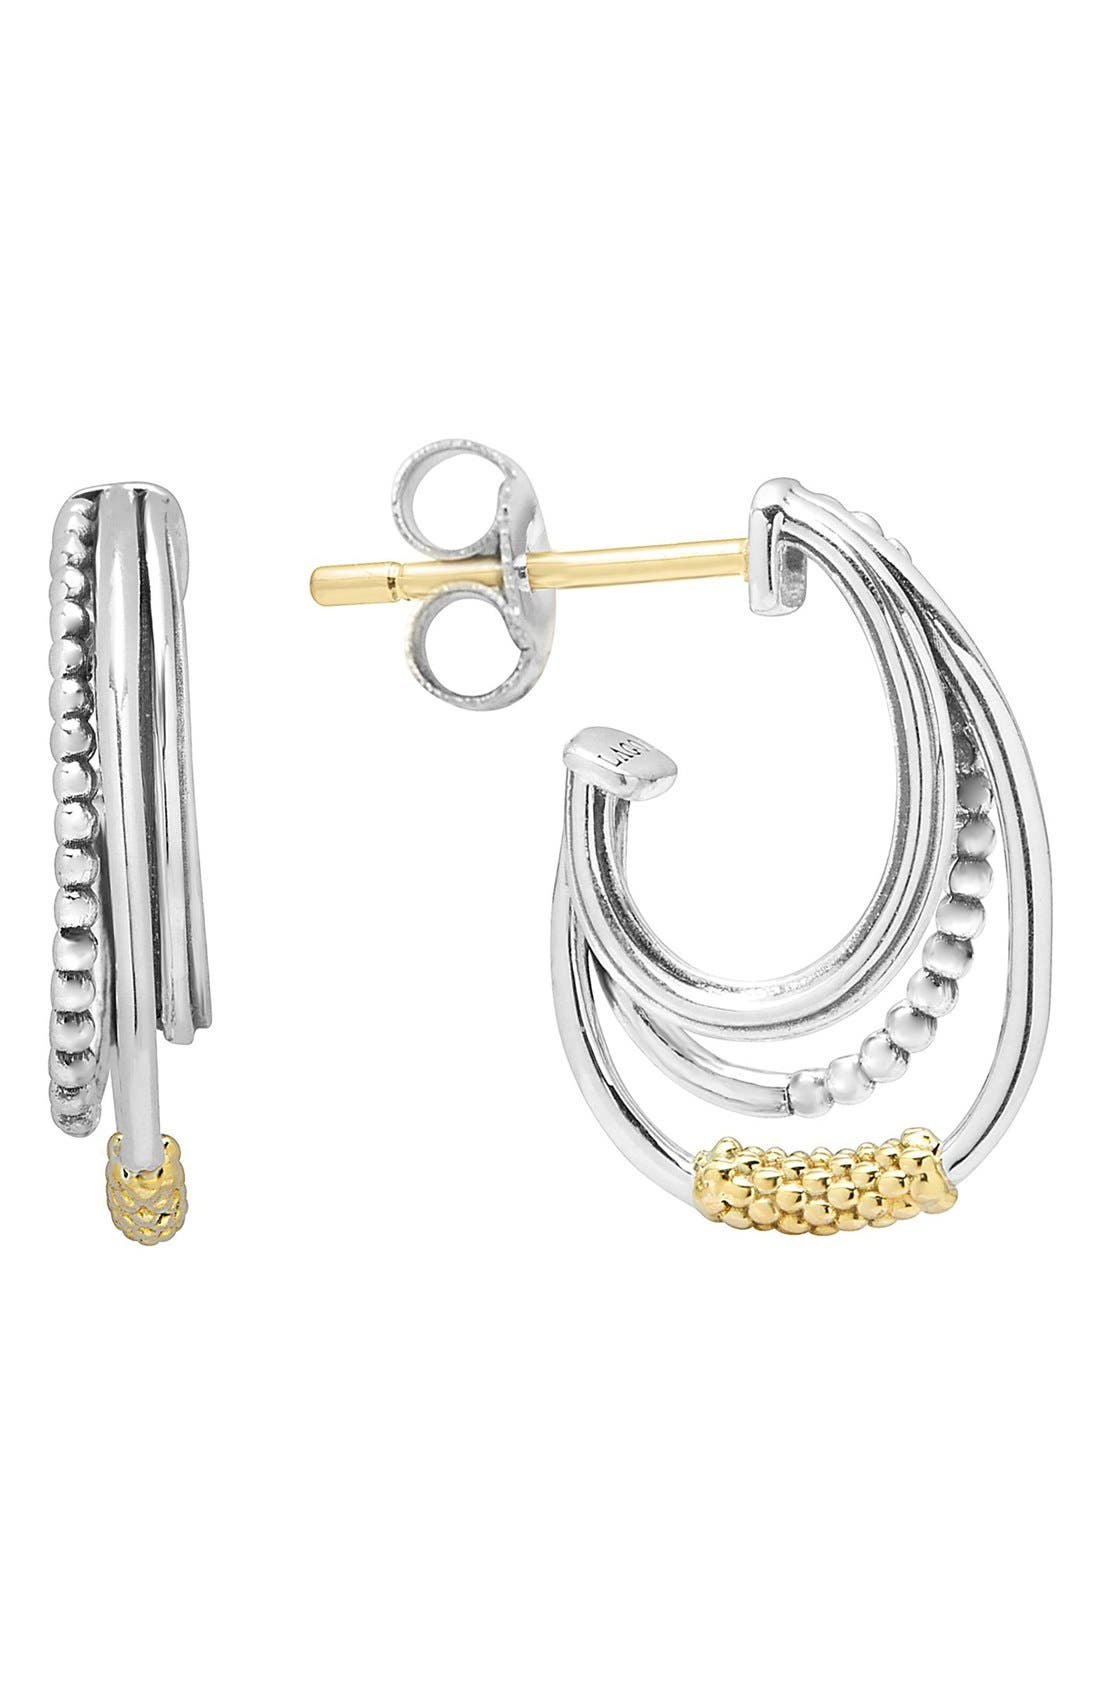 Alternate Image 1 Selected - LAGOS Caviar 'Superfine' Two-Tone Station Hoop Earrings